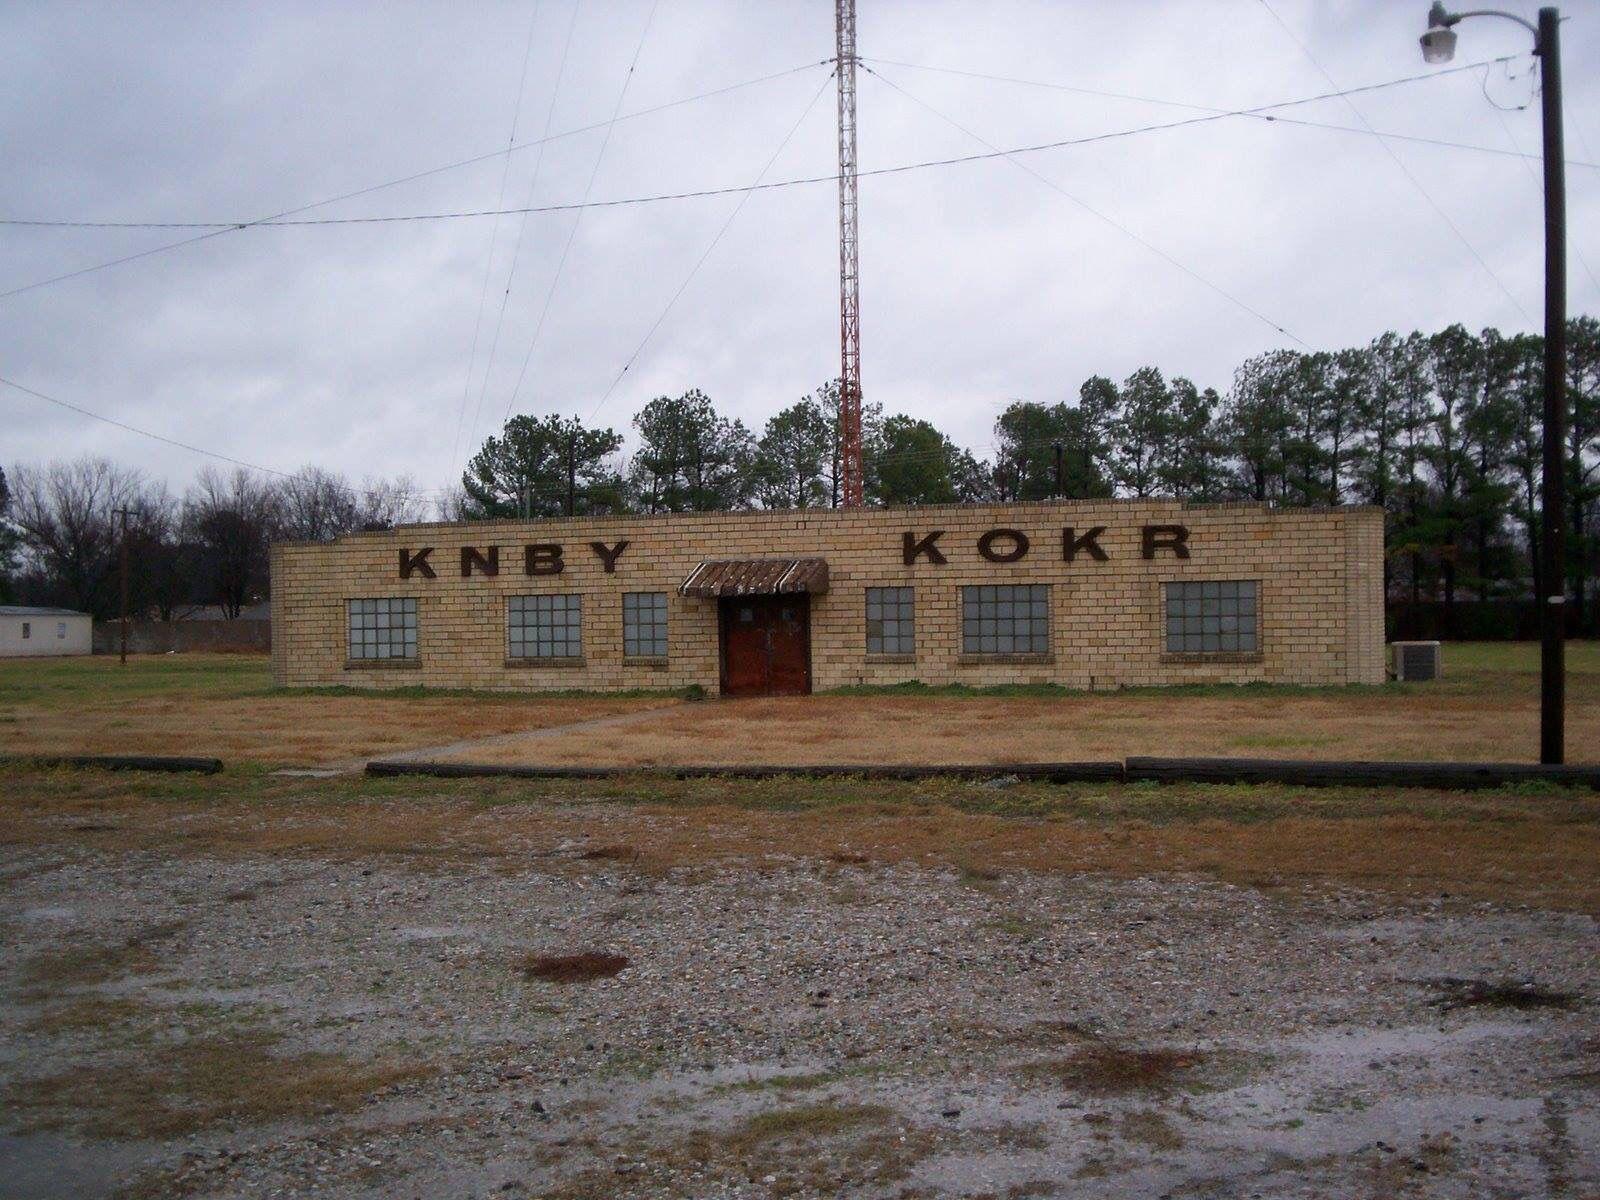 Old Knby Kokr Radio Station In Newport Arkansas It S Long Shut Down